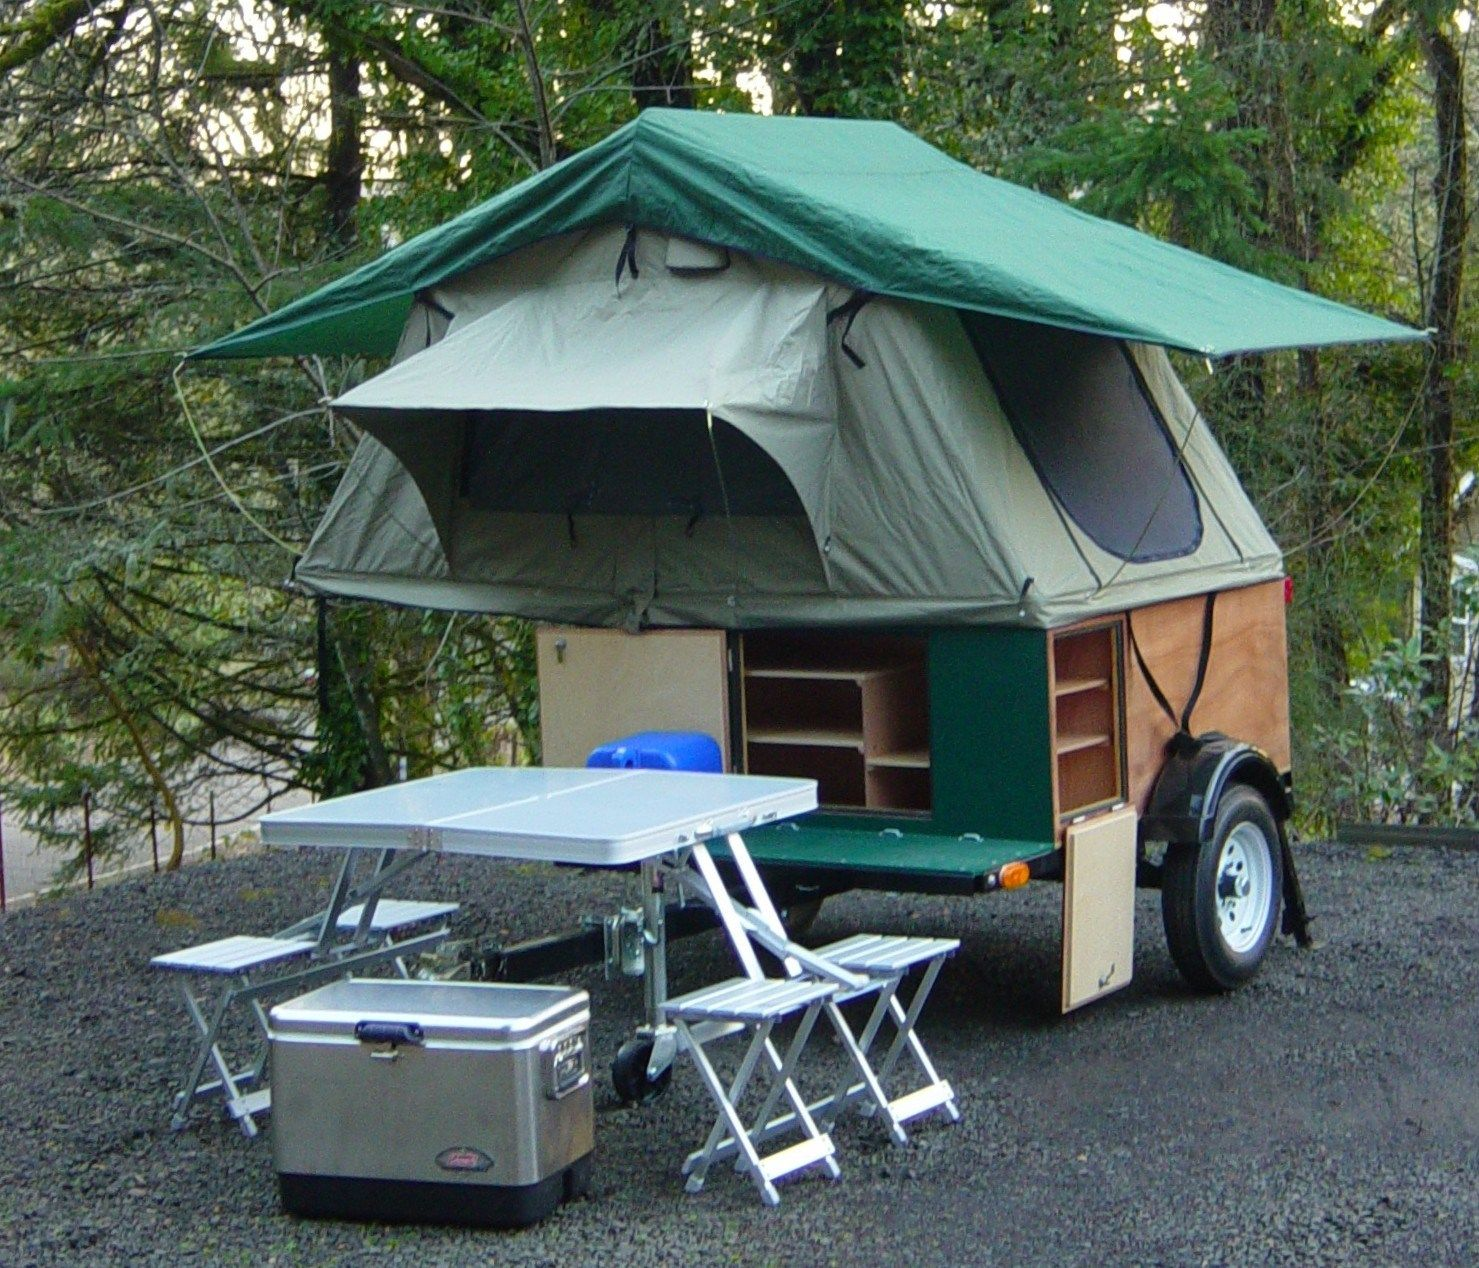 Compact Camping Concepts Diy Camper Trailer Diy Tent